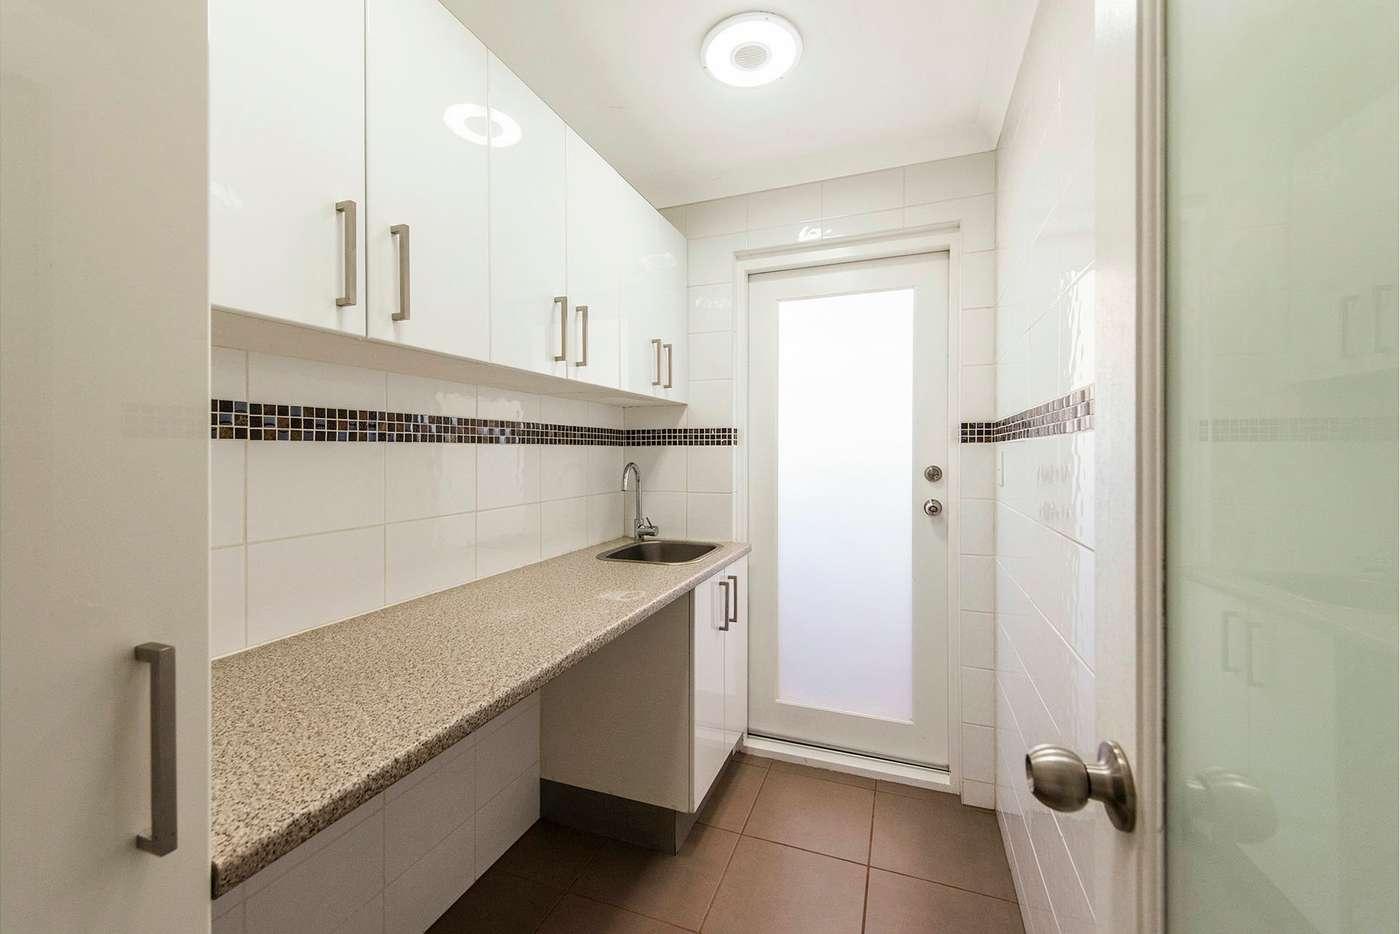 Seventh view of Homely villa listing, Villa 3/15 Egham Street, Burswood WA 6100